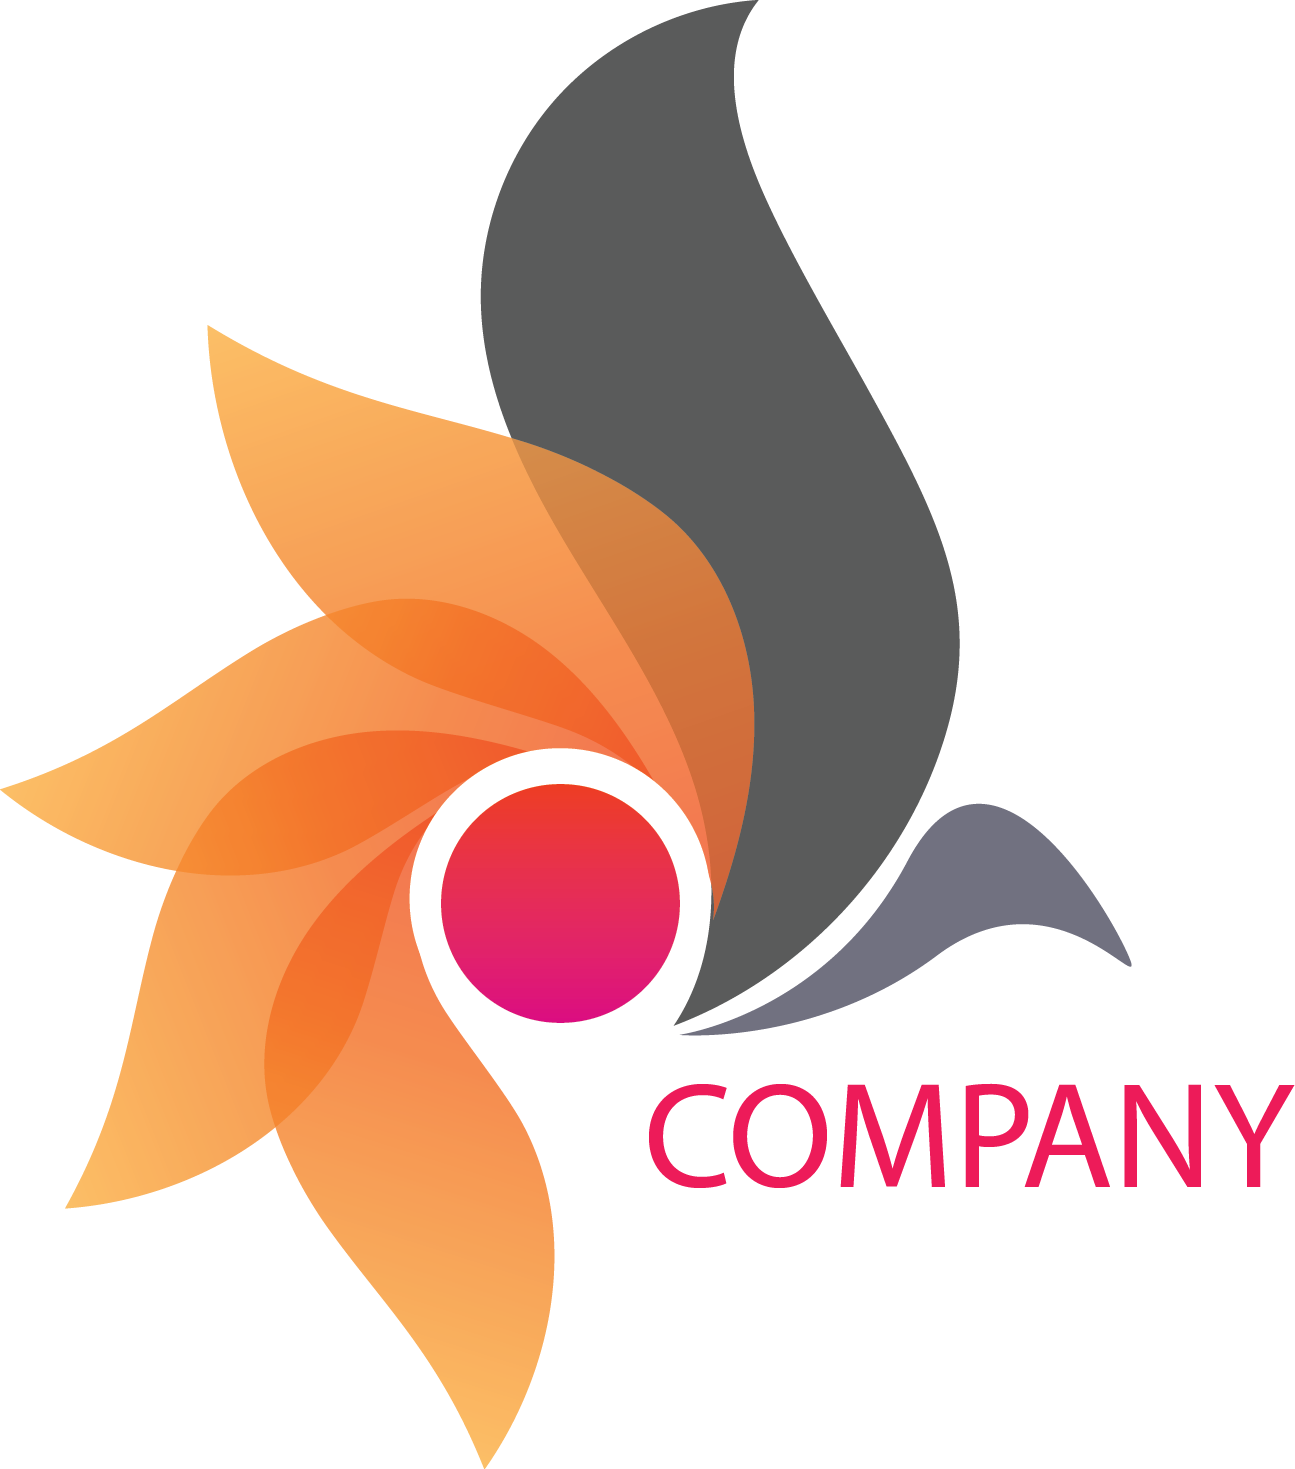 I can design a professional logo